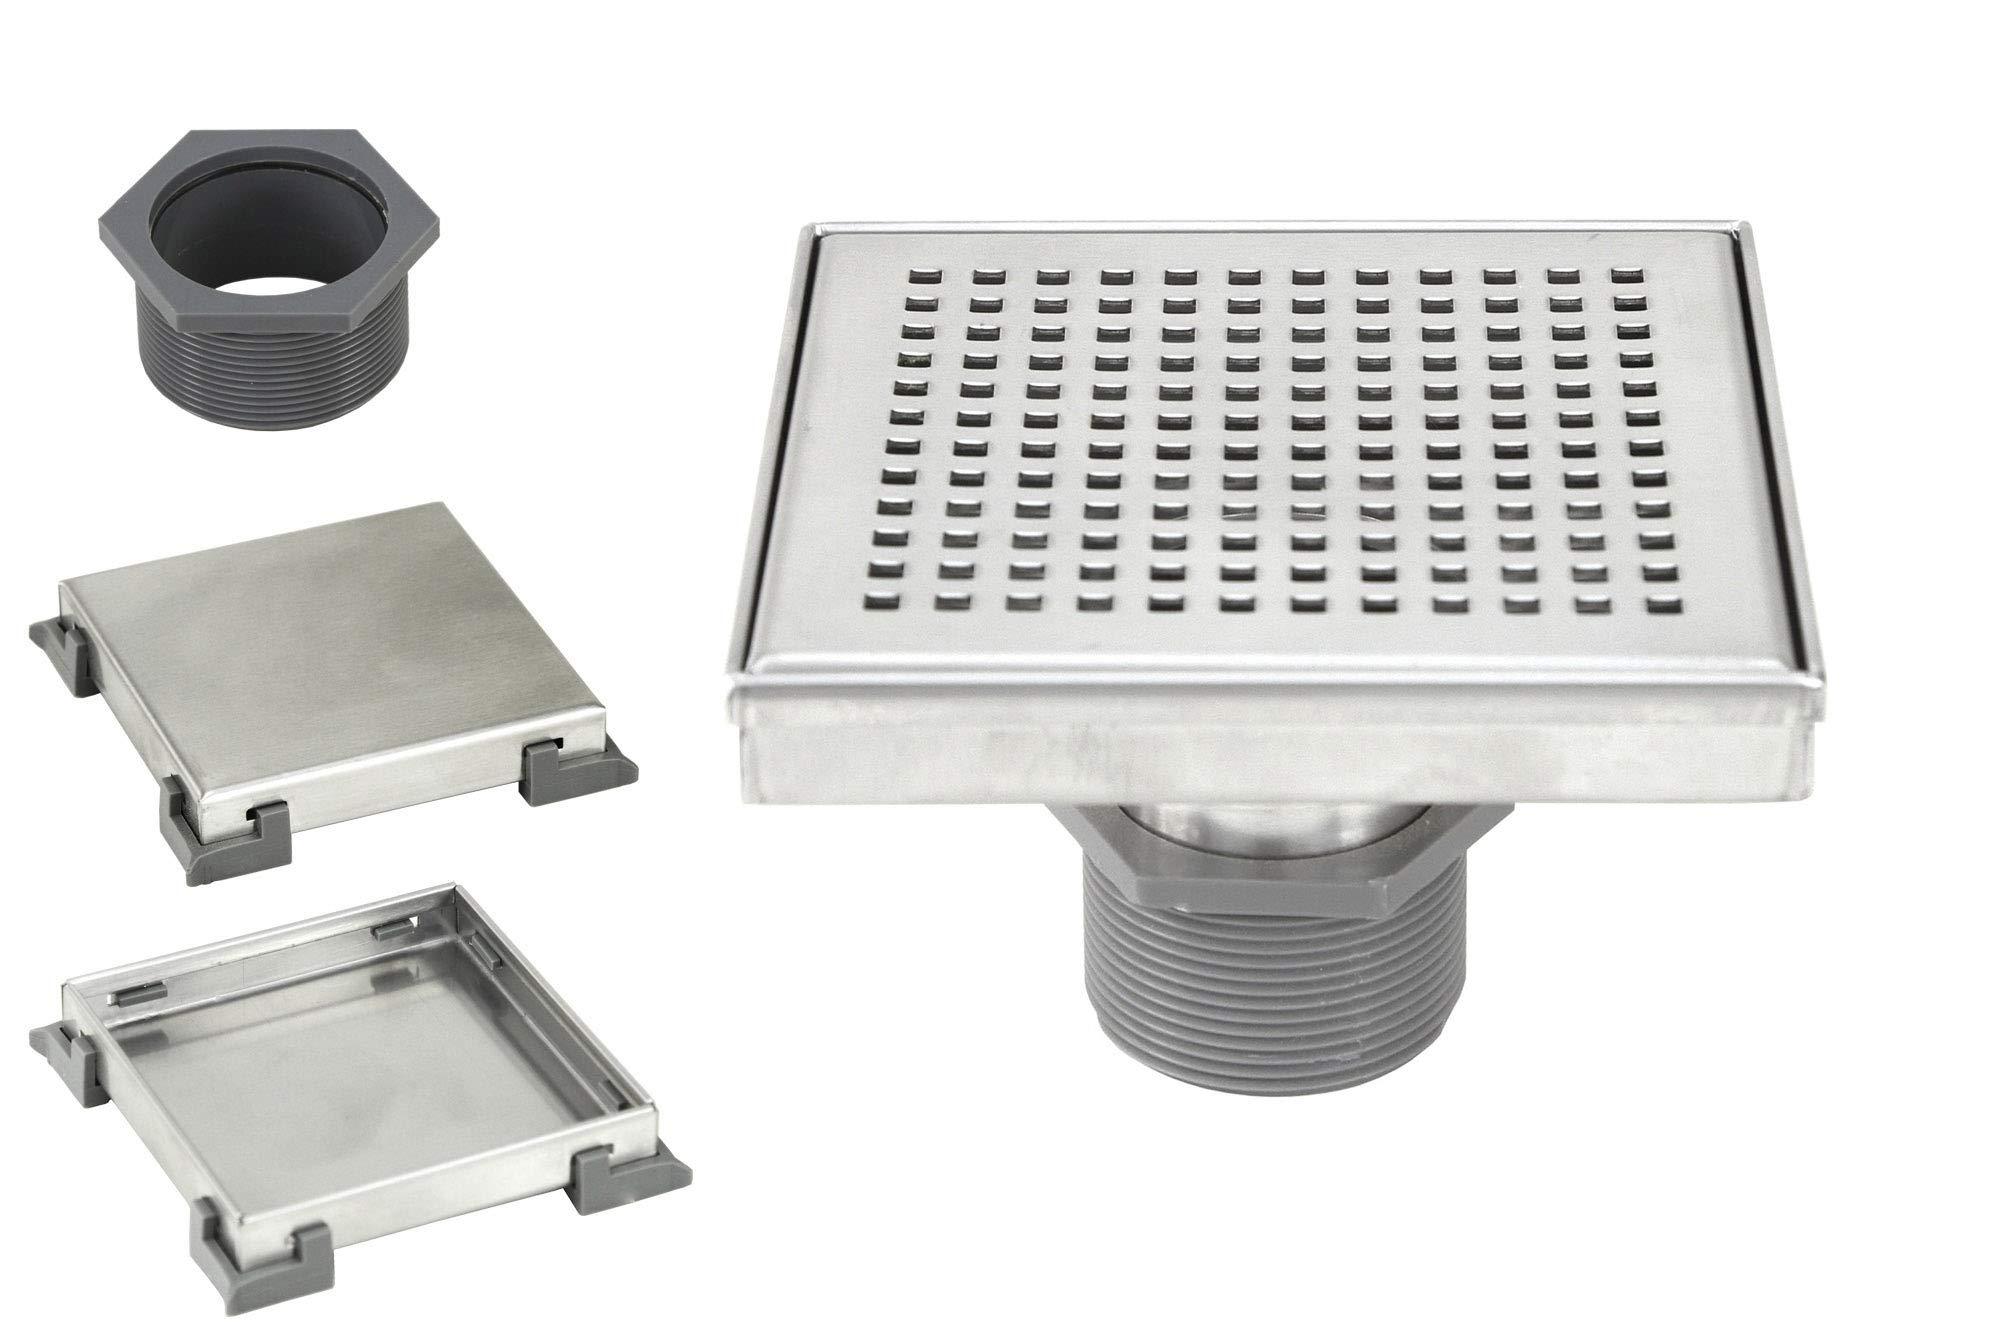 eModernDecor 6 Inch Shower Square Shower Floor Drain – Brushed 304 Stainless Steel – Bonus 2 IN 1 Reversible Tile Insert & Flat Grate and Threaded Adaptor (6 Inch Square Checker Pattern)